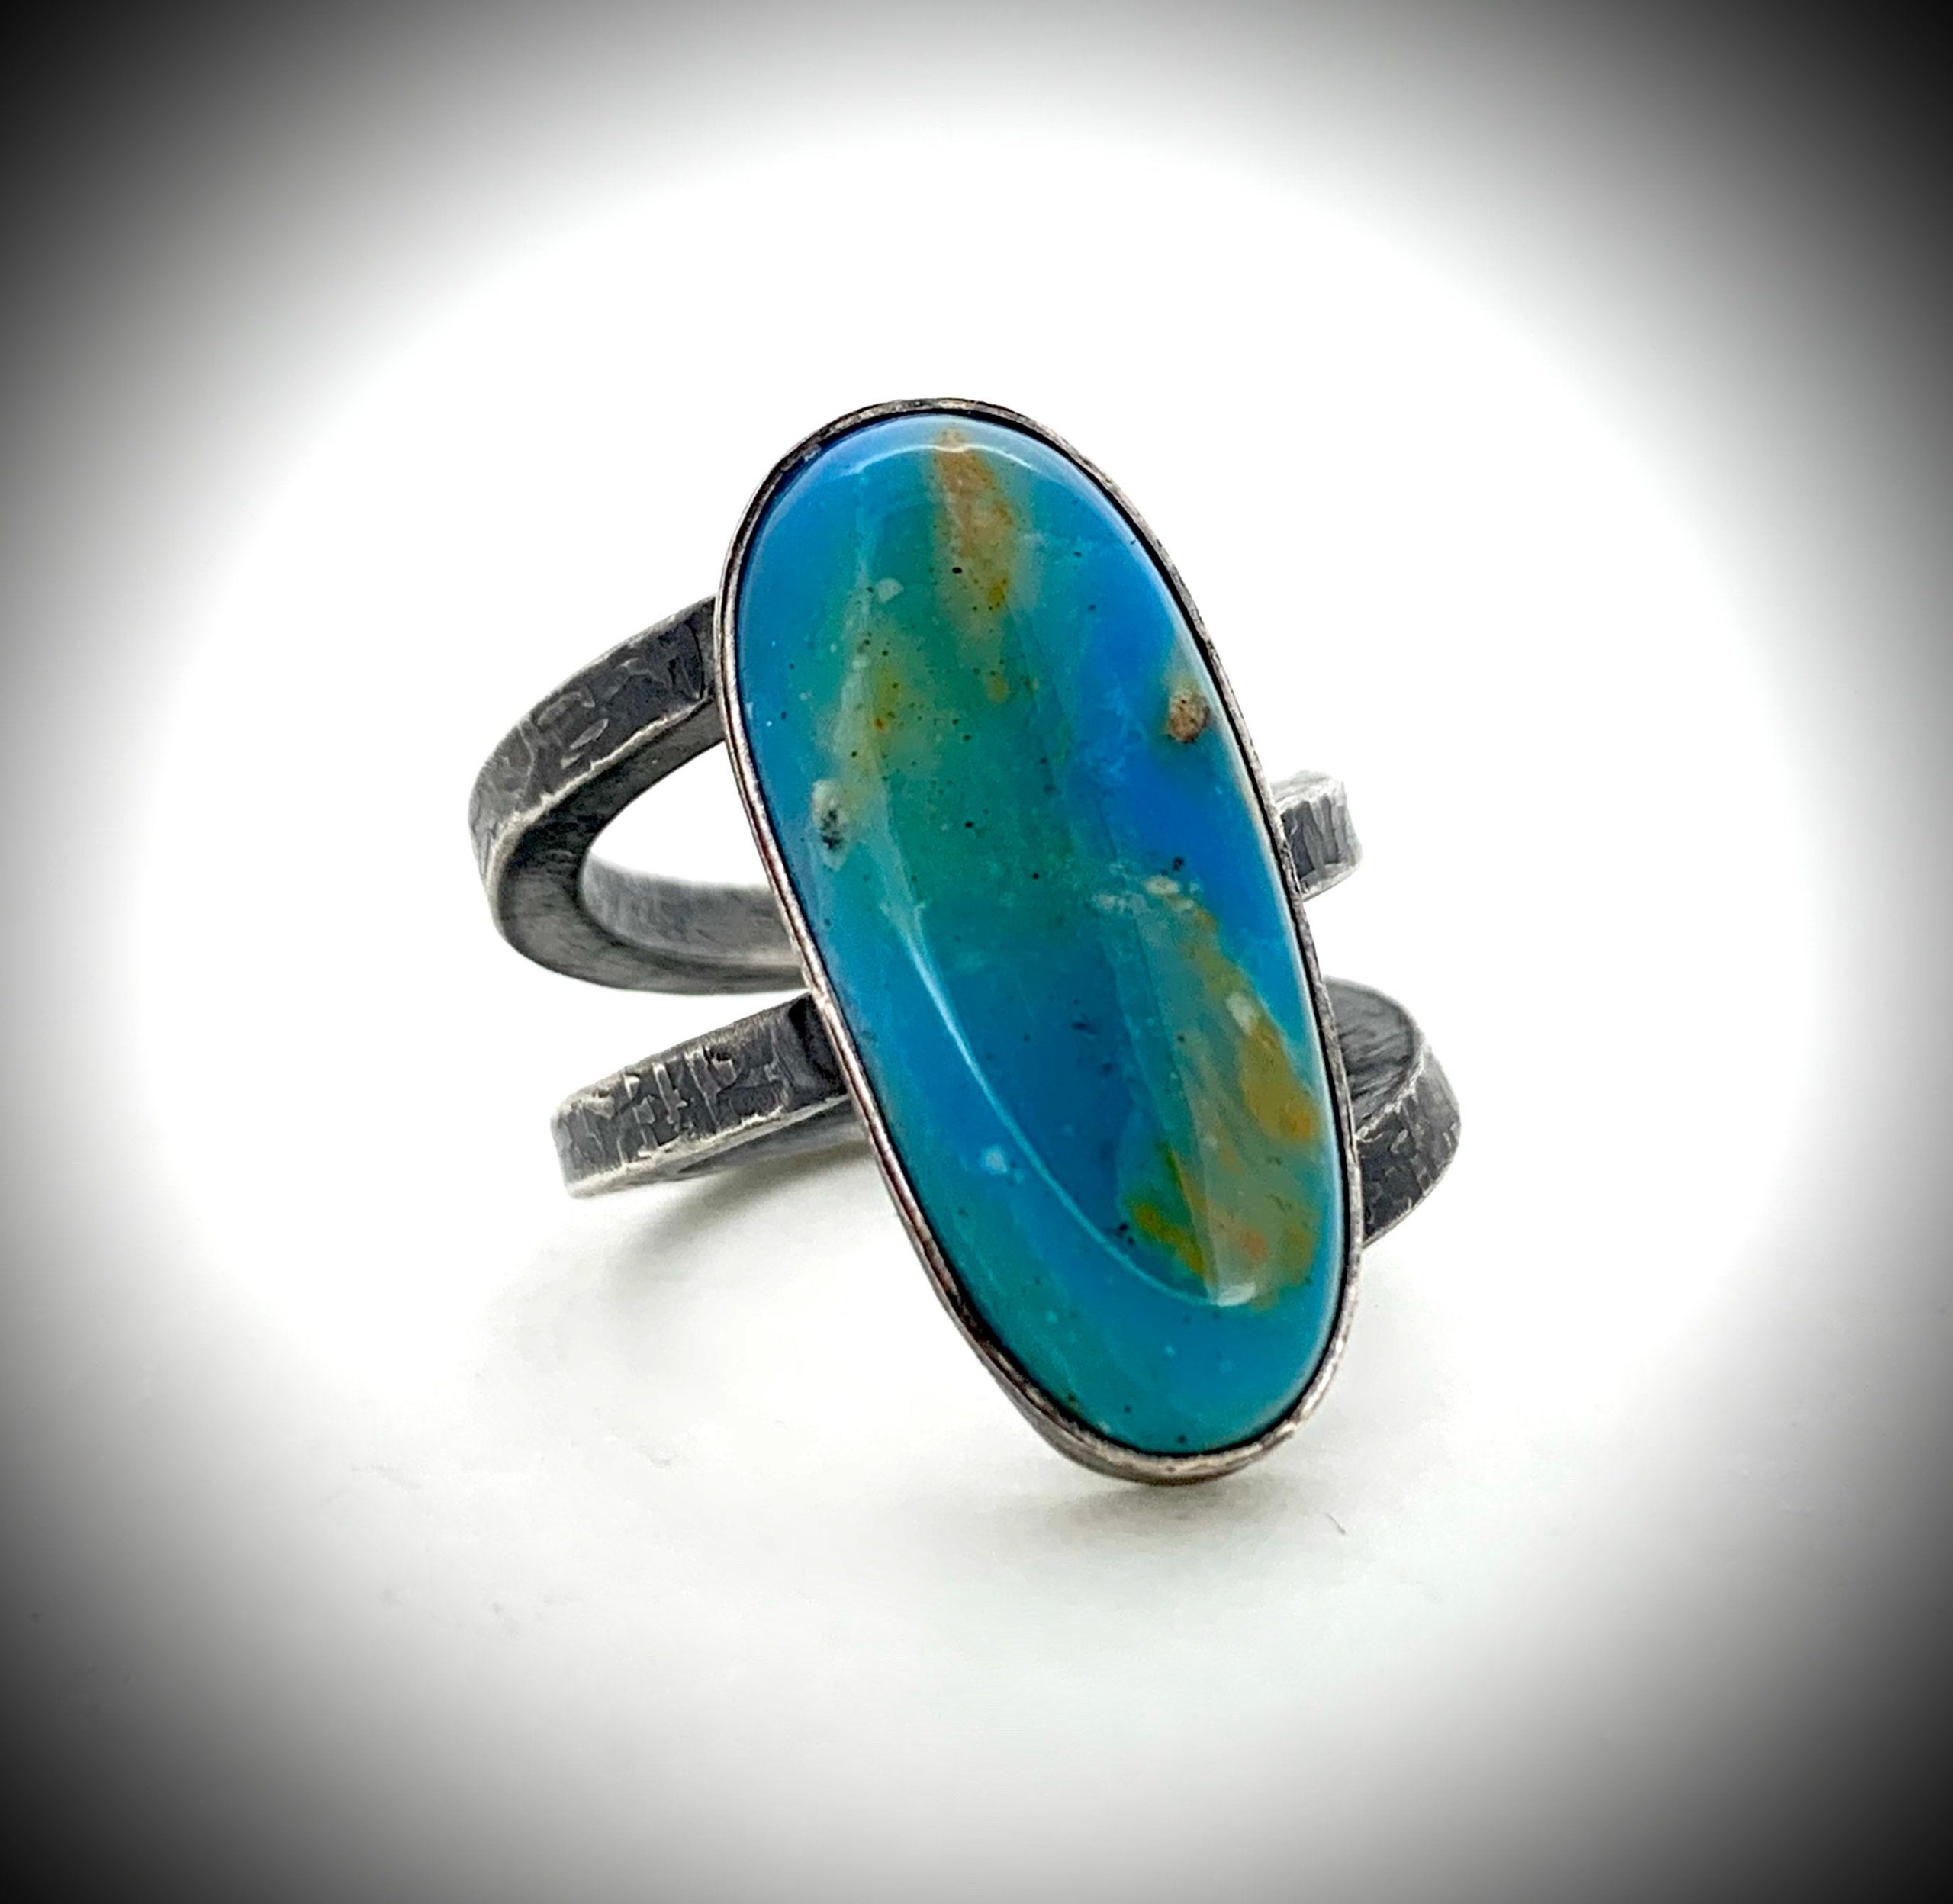 Peruvian Blue Opal Ring